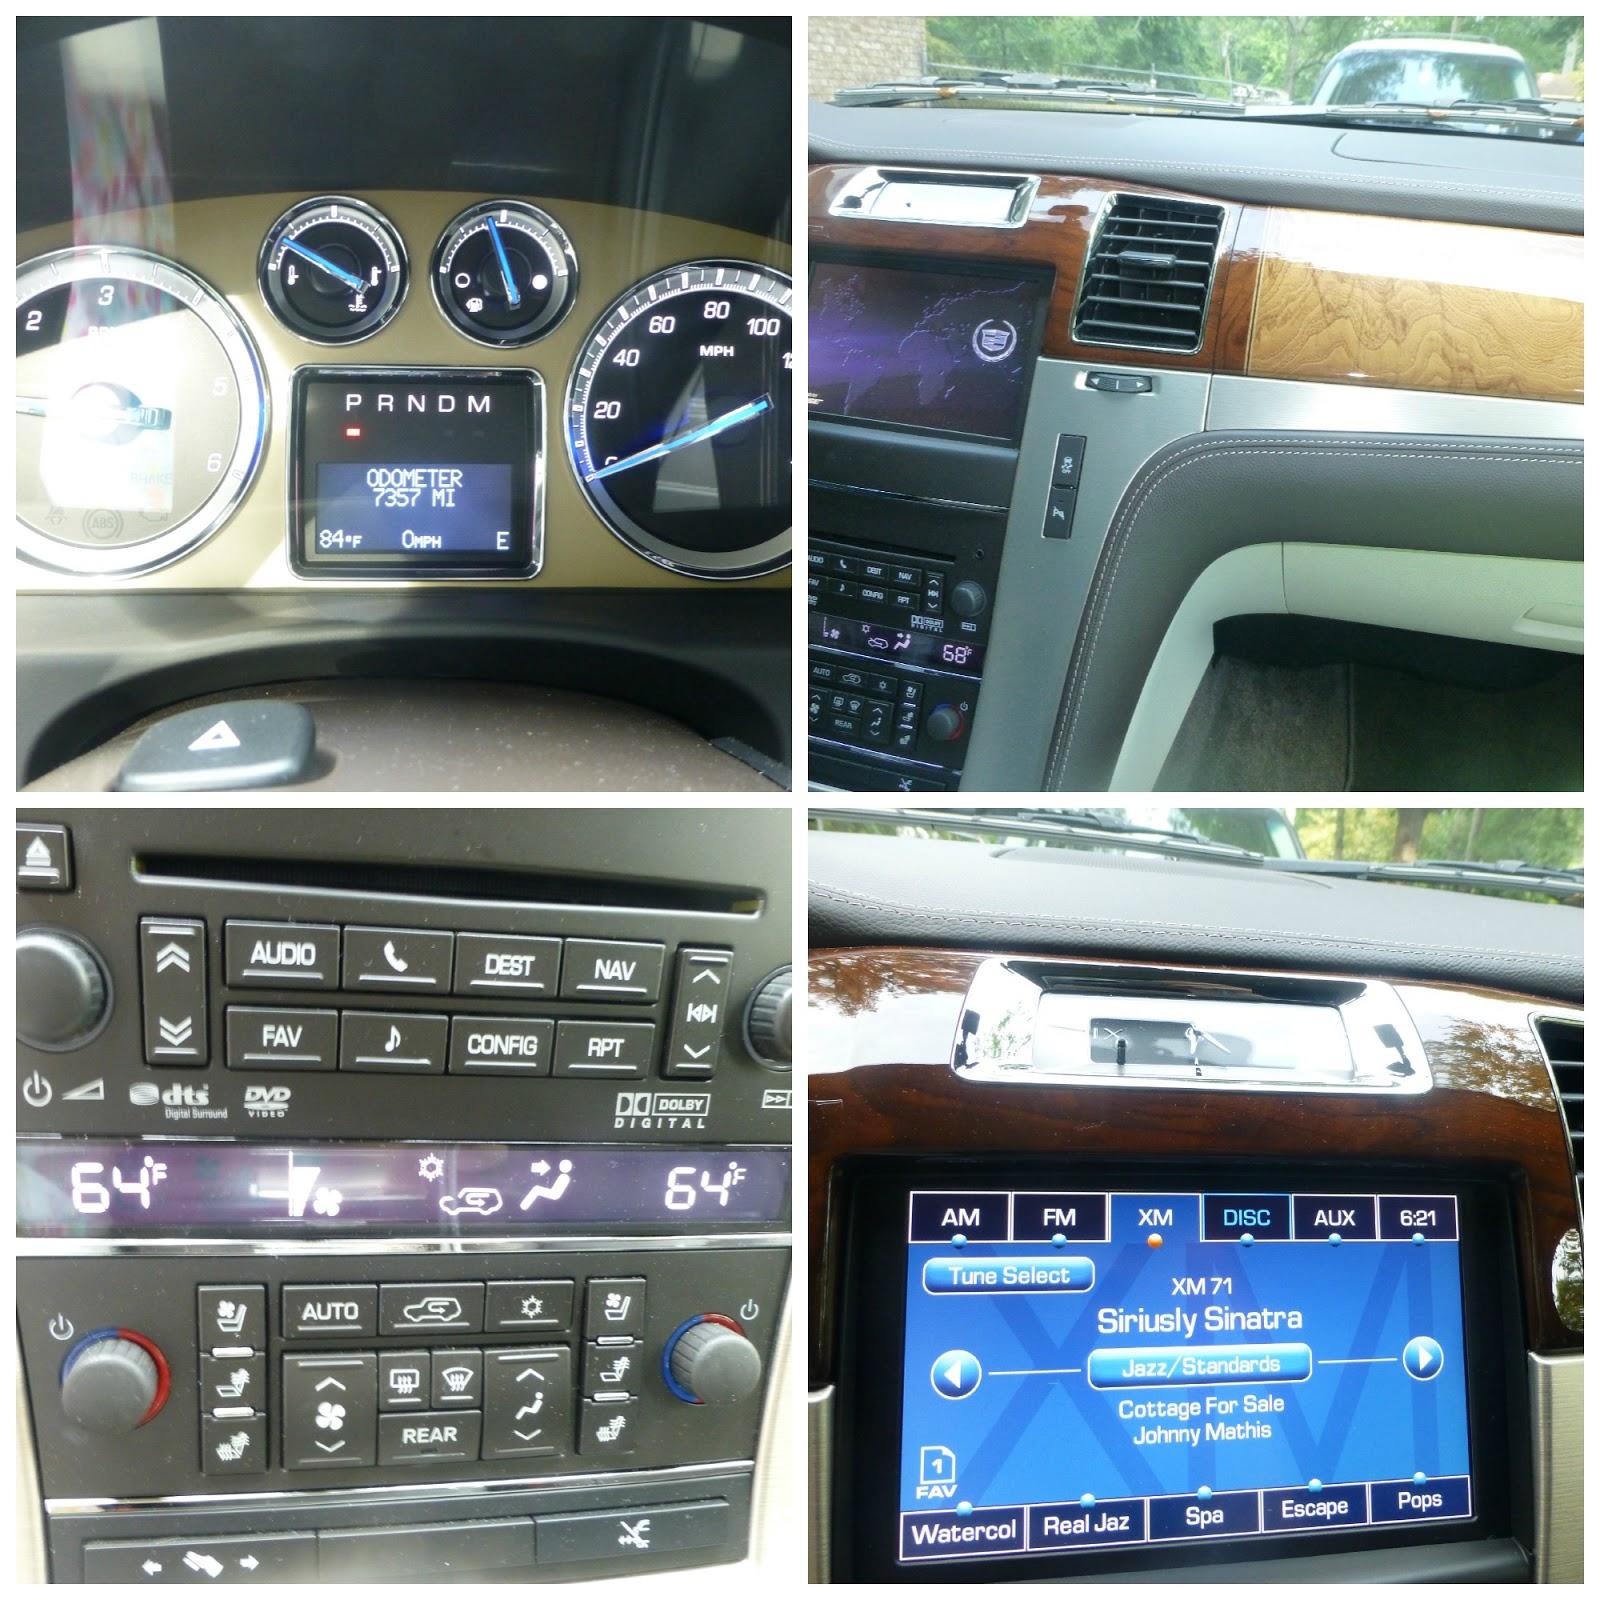 The 2013 Cadillac Escalade ESV Platinum Edition